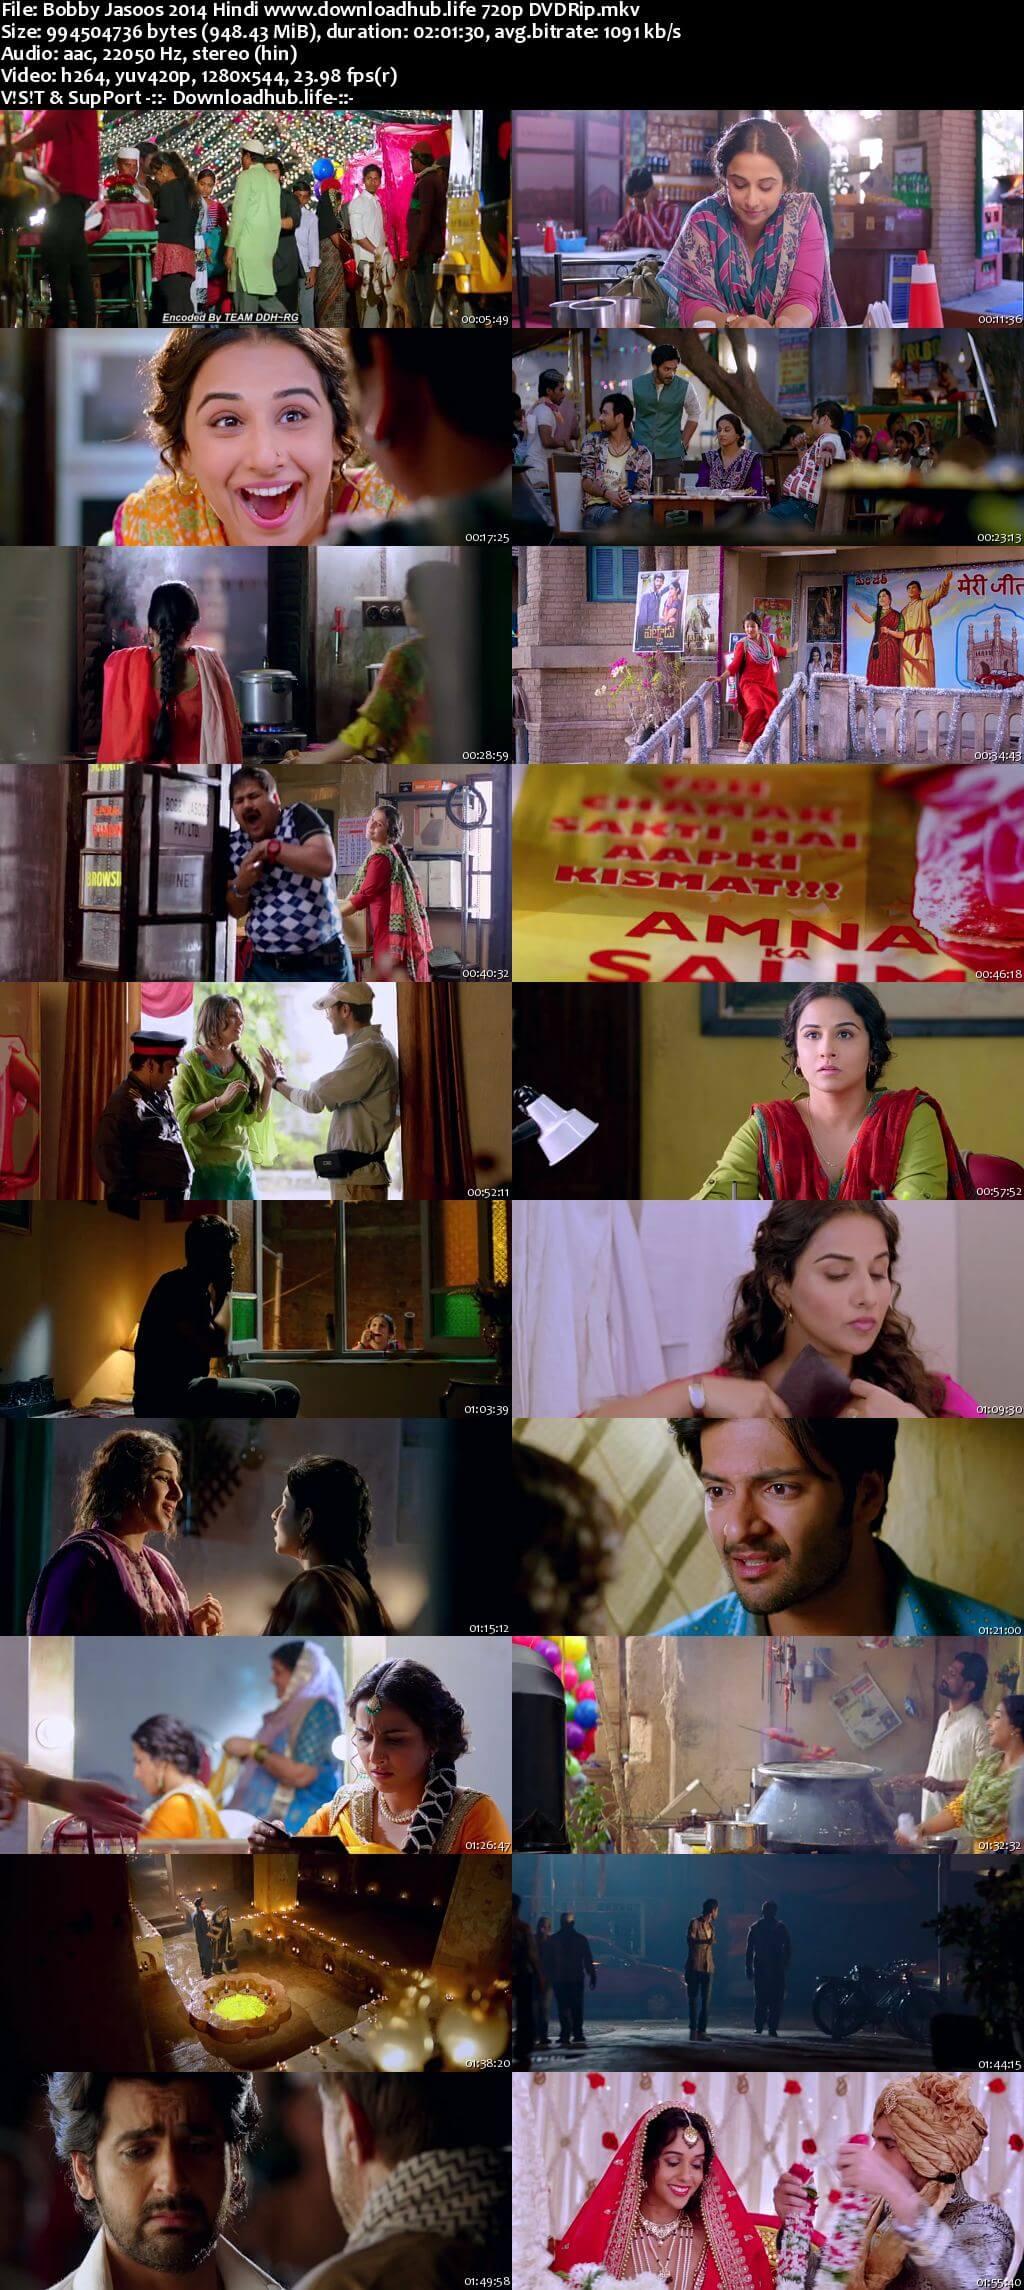 Bobby Jasoos 2014 Hindi 720p DVDRip x264